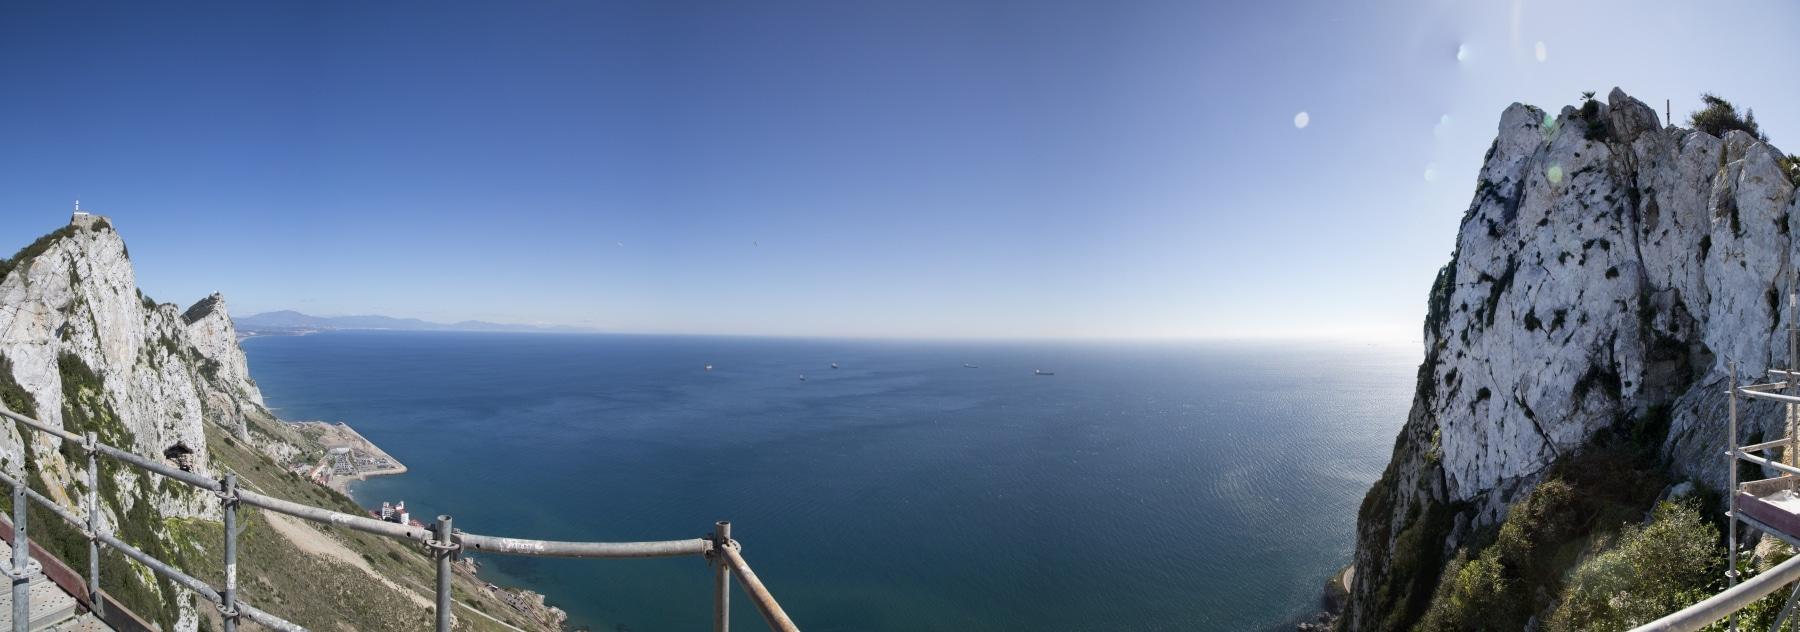 panorama-13_24765595827_o